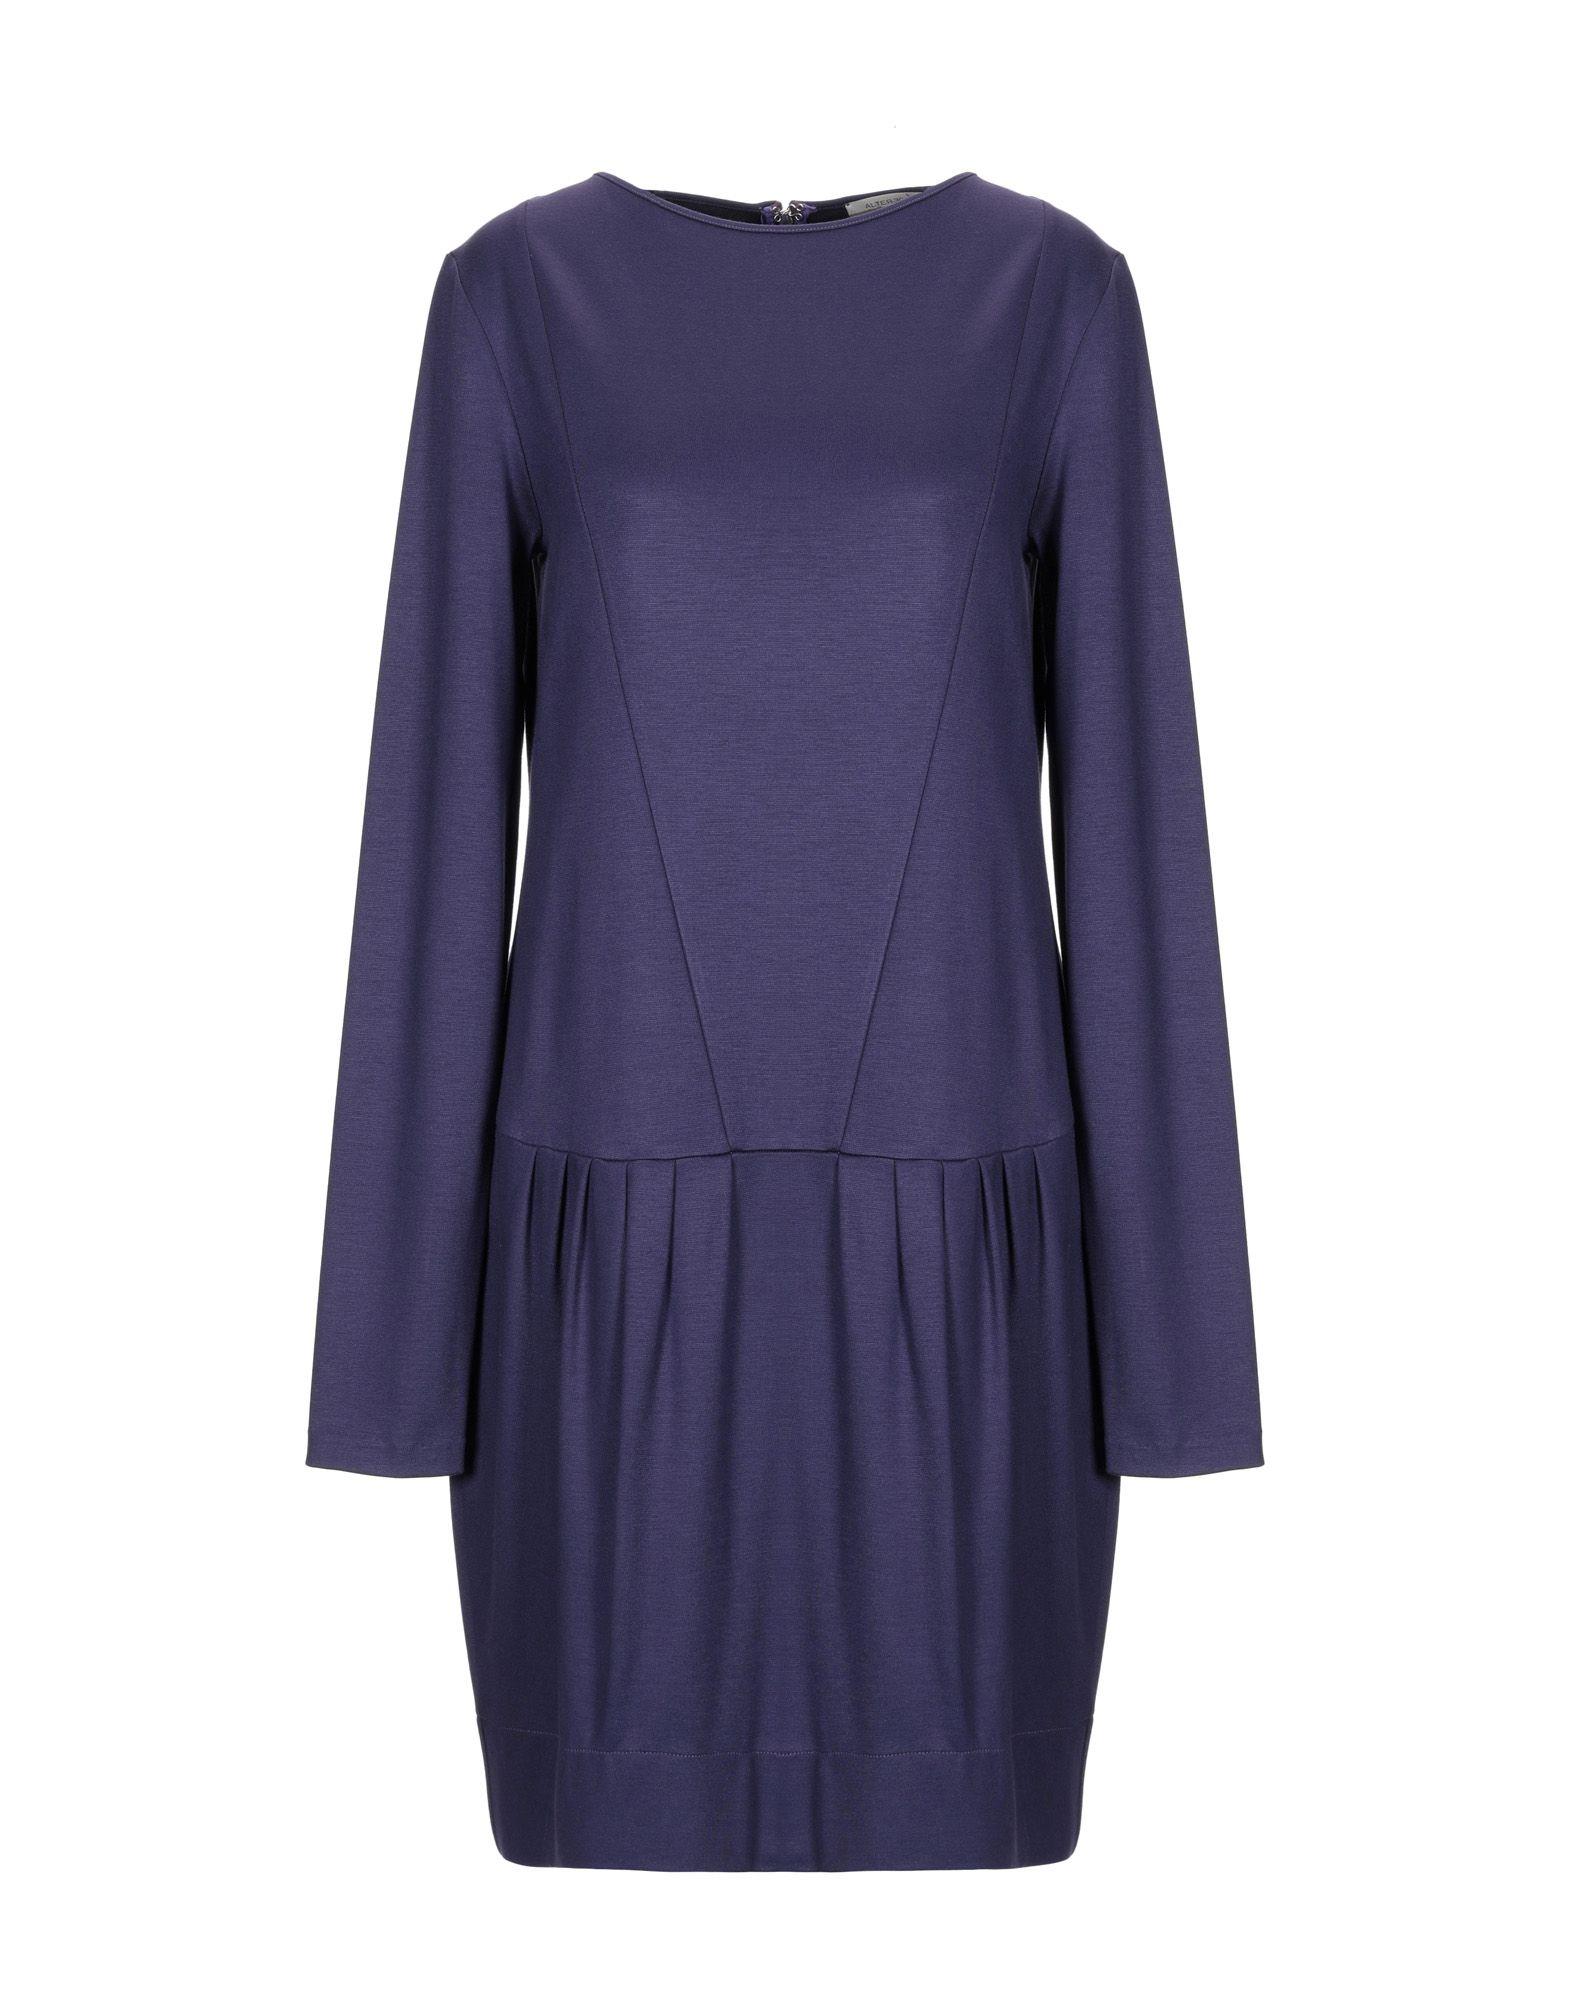 ALTEЯƎGO Короткое платье